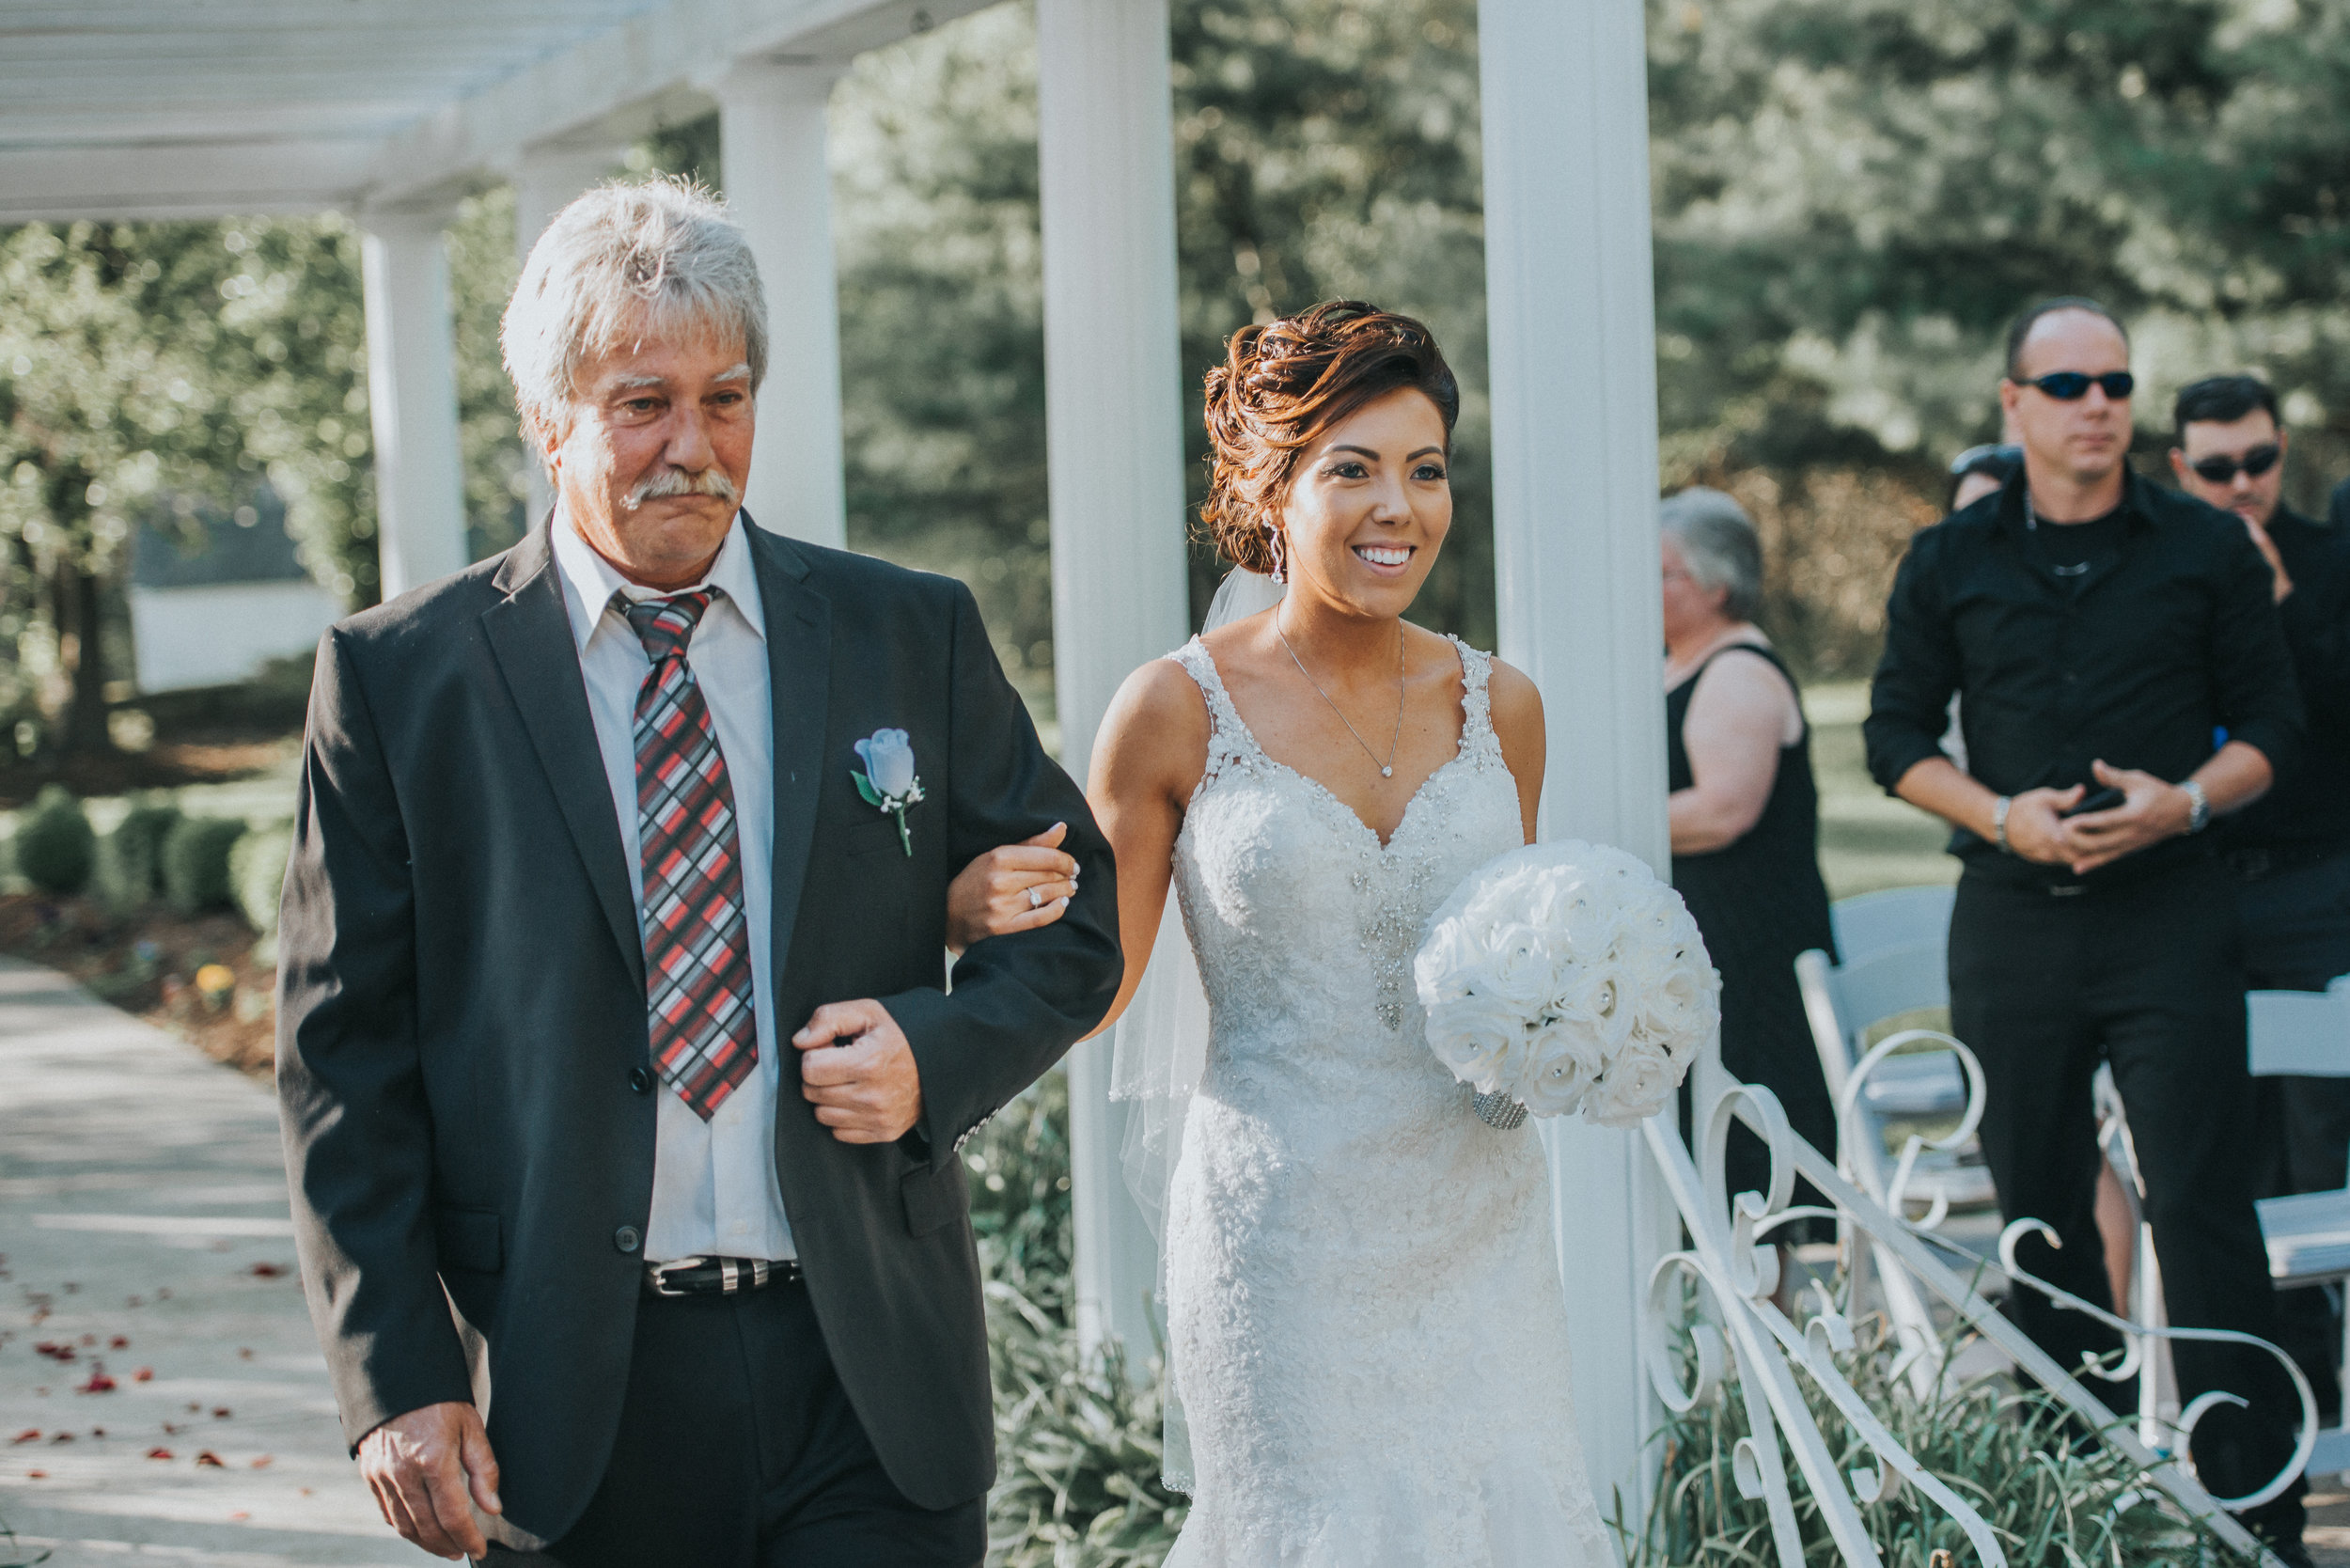 Christina-and-Gene-Wedding-Marla-Rain-Photography-321.jpg